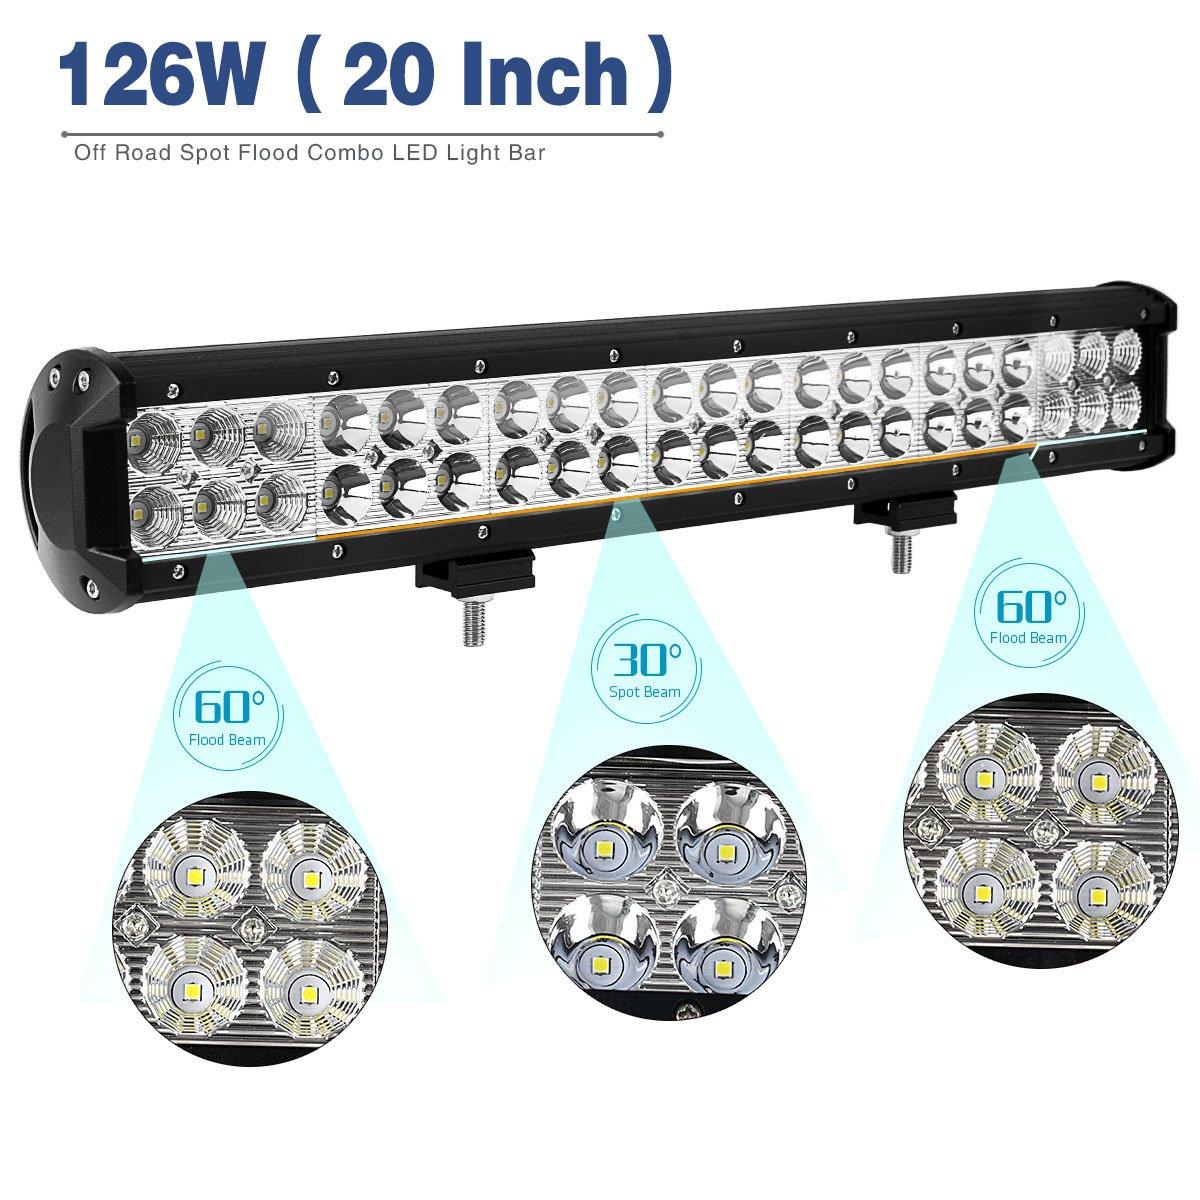 Amazon.com: YITAMOTOR 20 inch LED Light Bar Spot Flood Combo ...